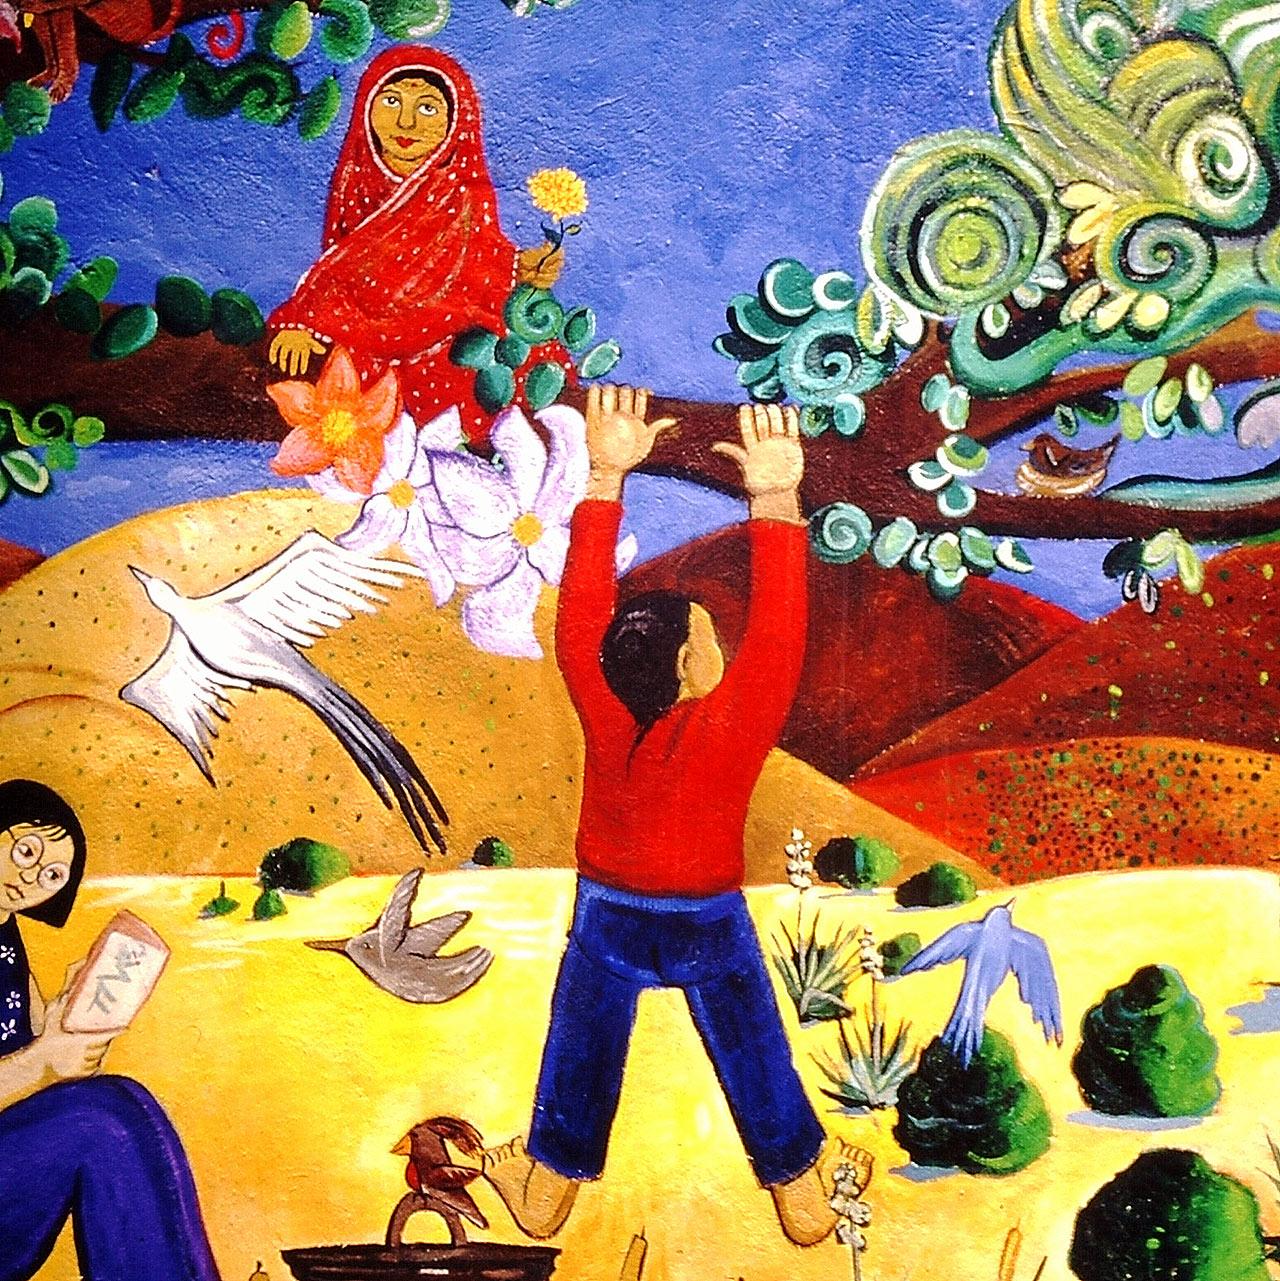 Santa Fe Outside Art on Wall Child Climbing Tree